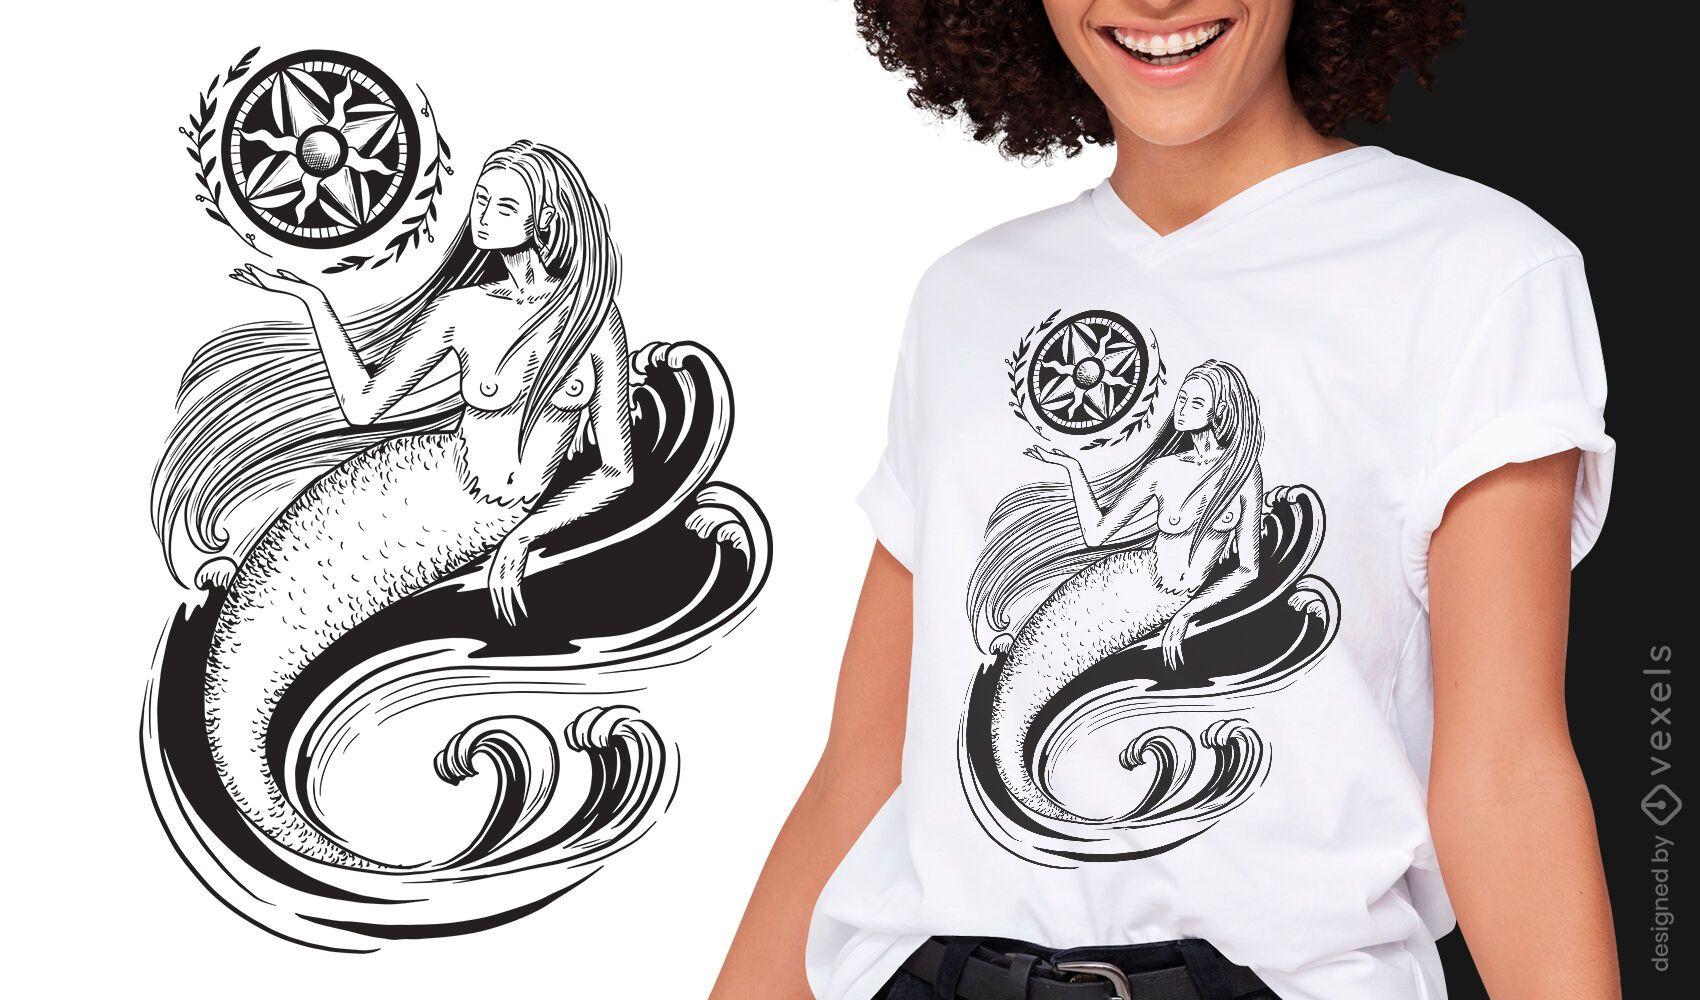 Mermaid dark art nouveau t-shirt design